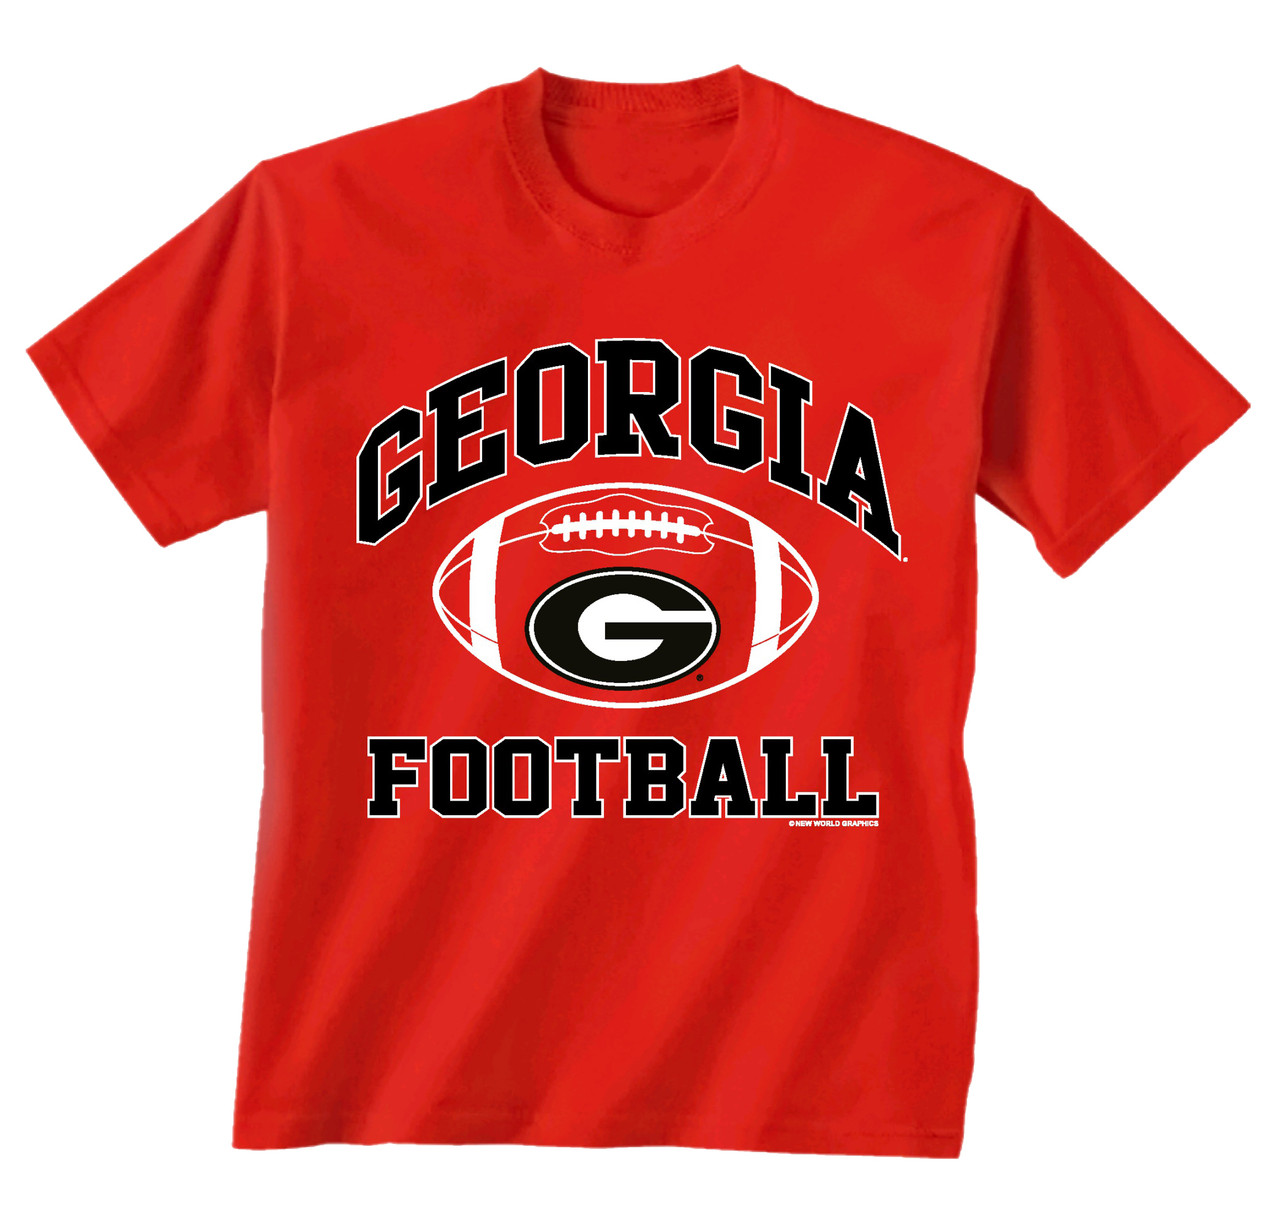 quality design 8cf8f 55f70 New World Graphics Georgia Bulldogs 2017 Georgia Football T-shirt